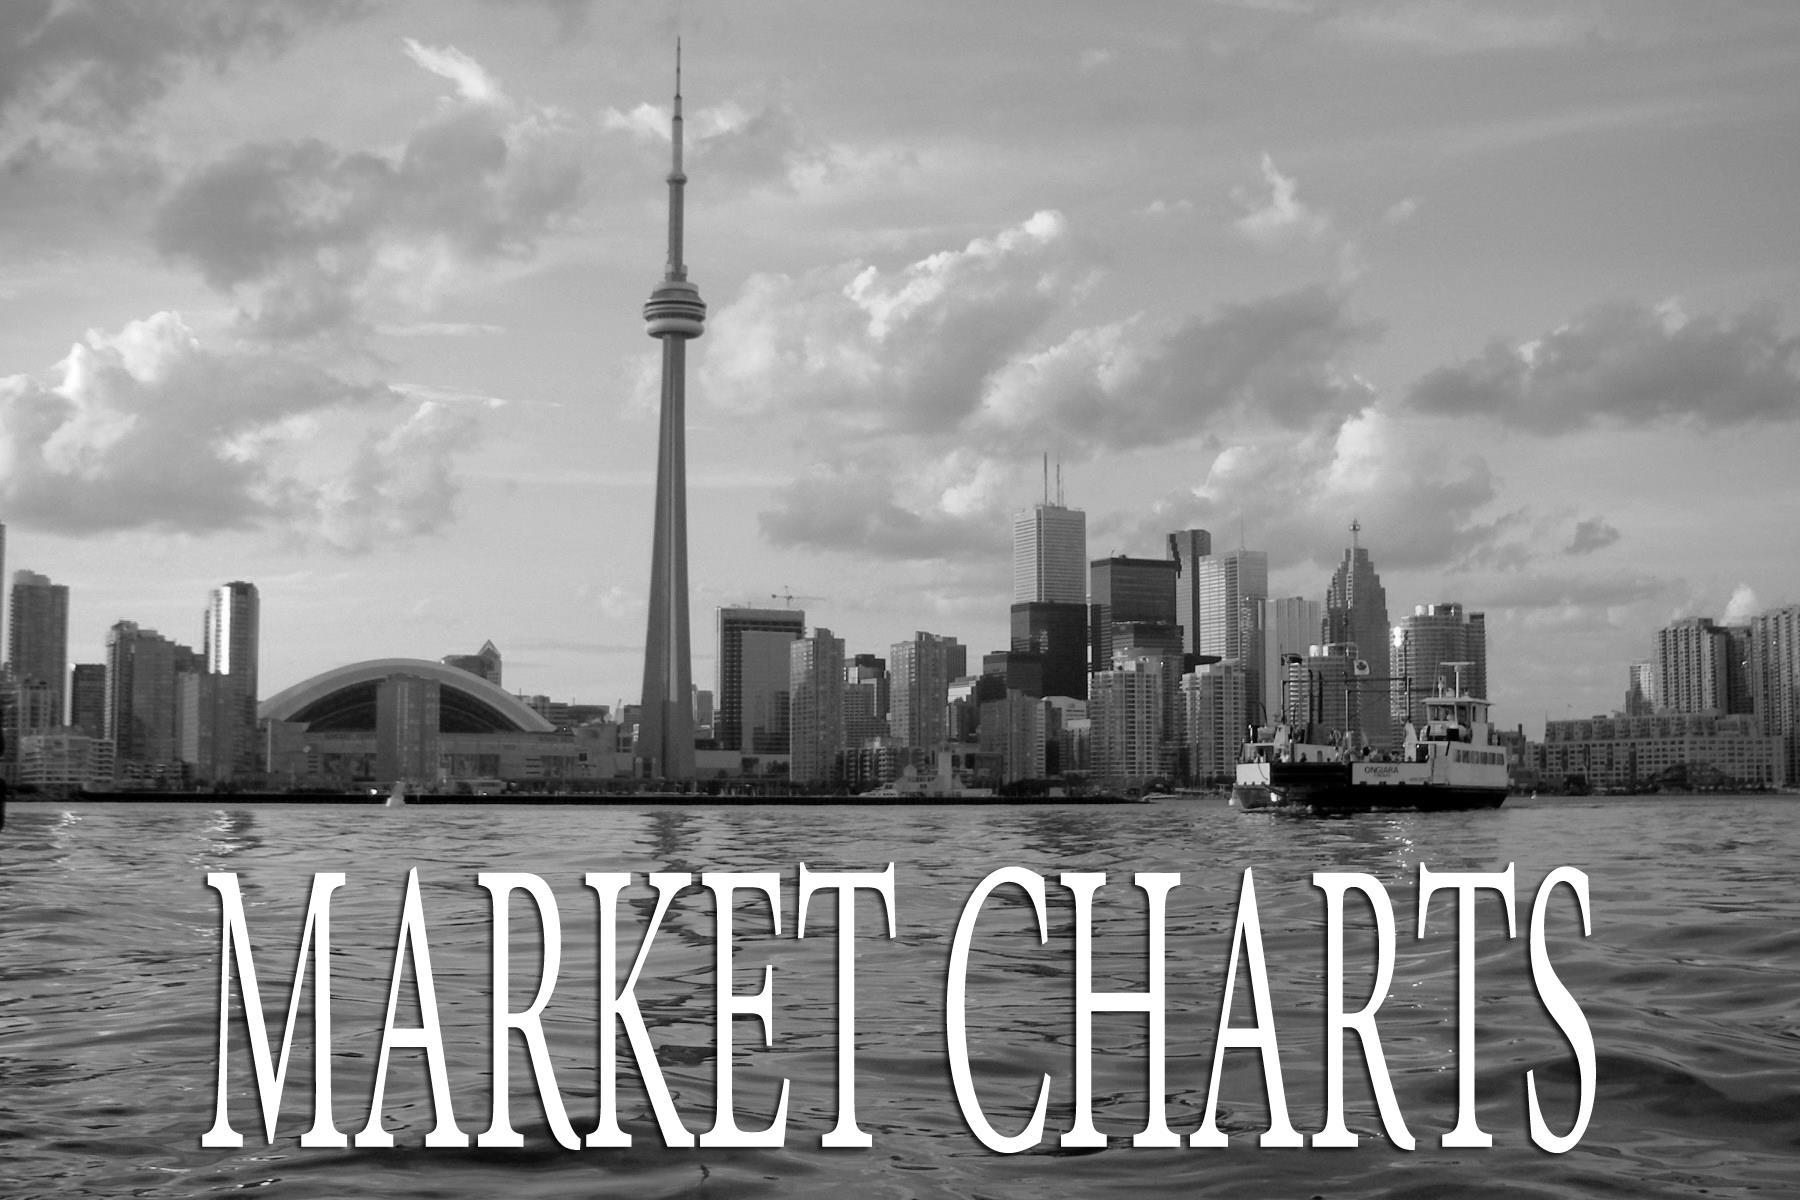 Totonto Market Charts